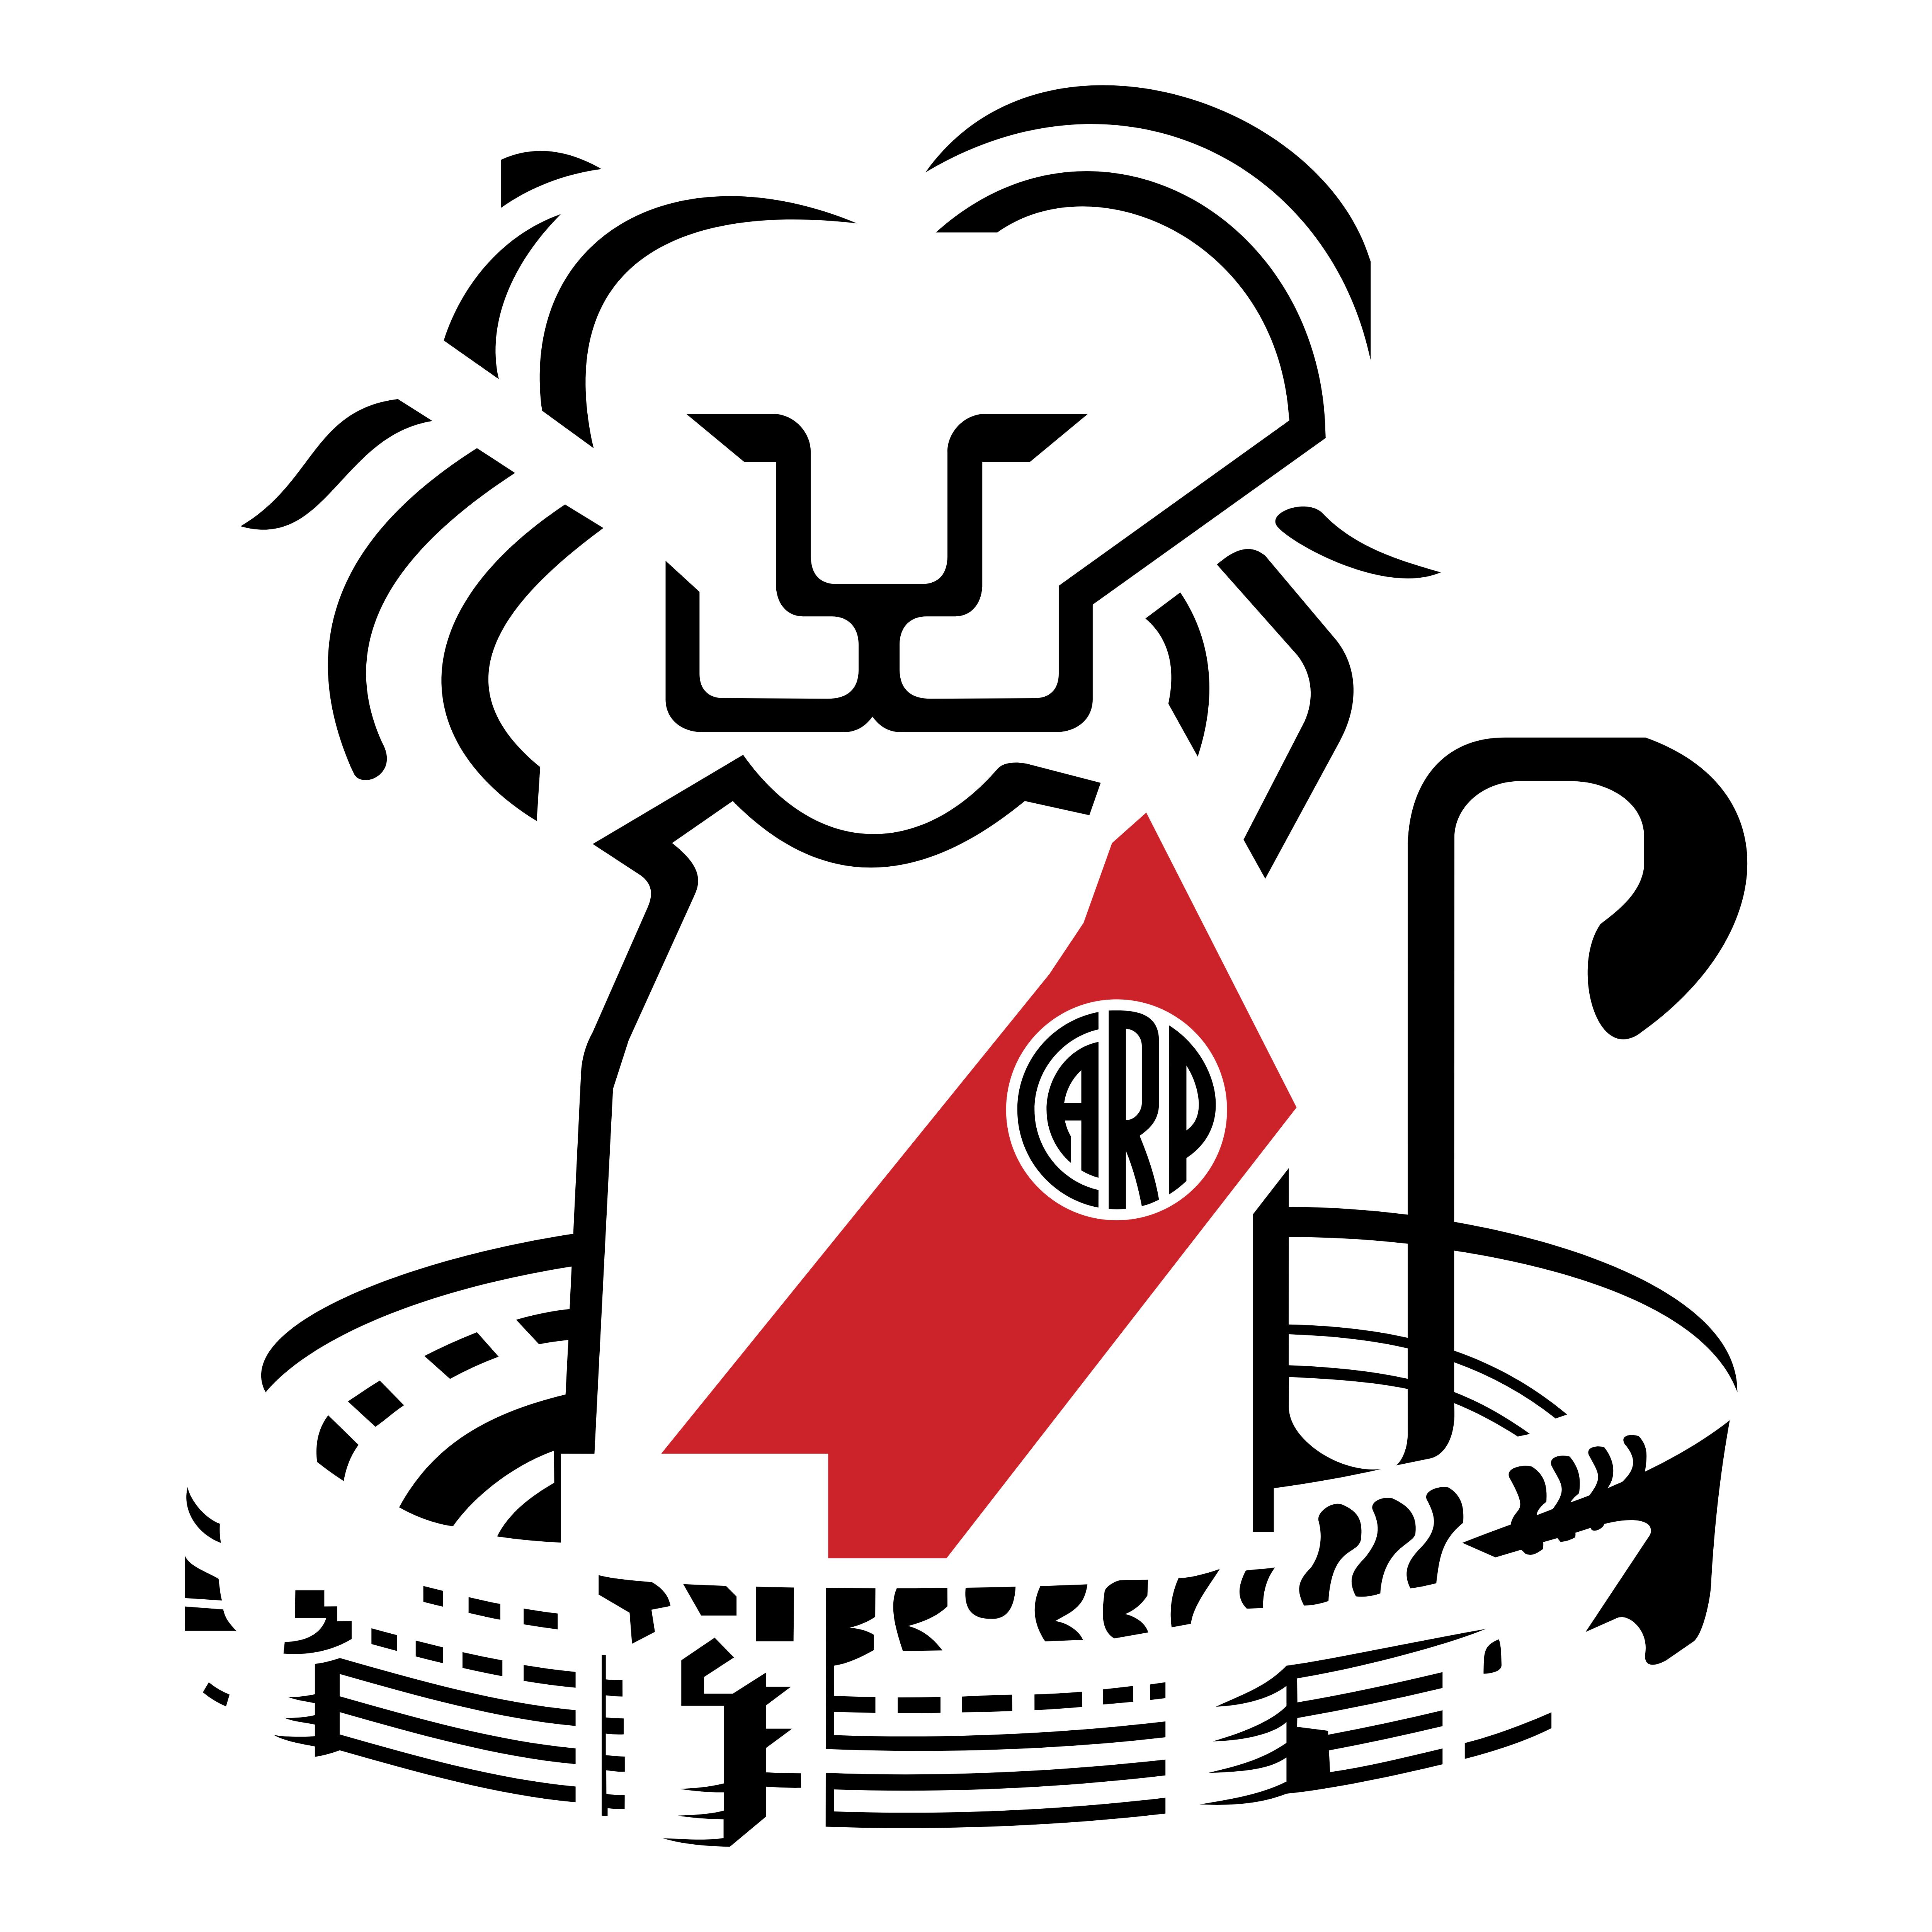 Carp Leo Logo on Boca Juniors Logo